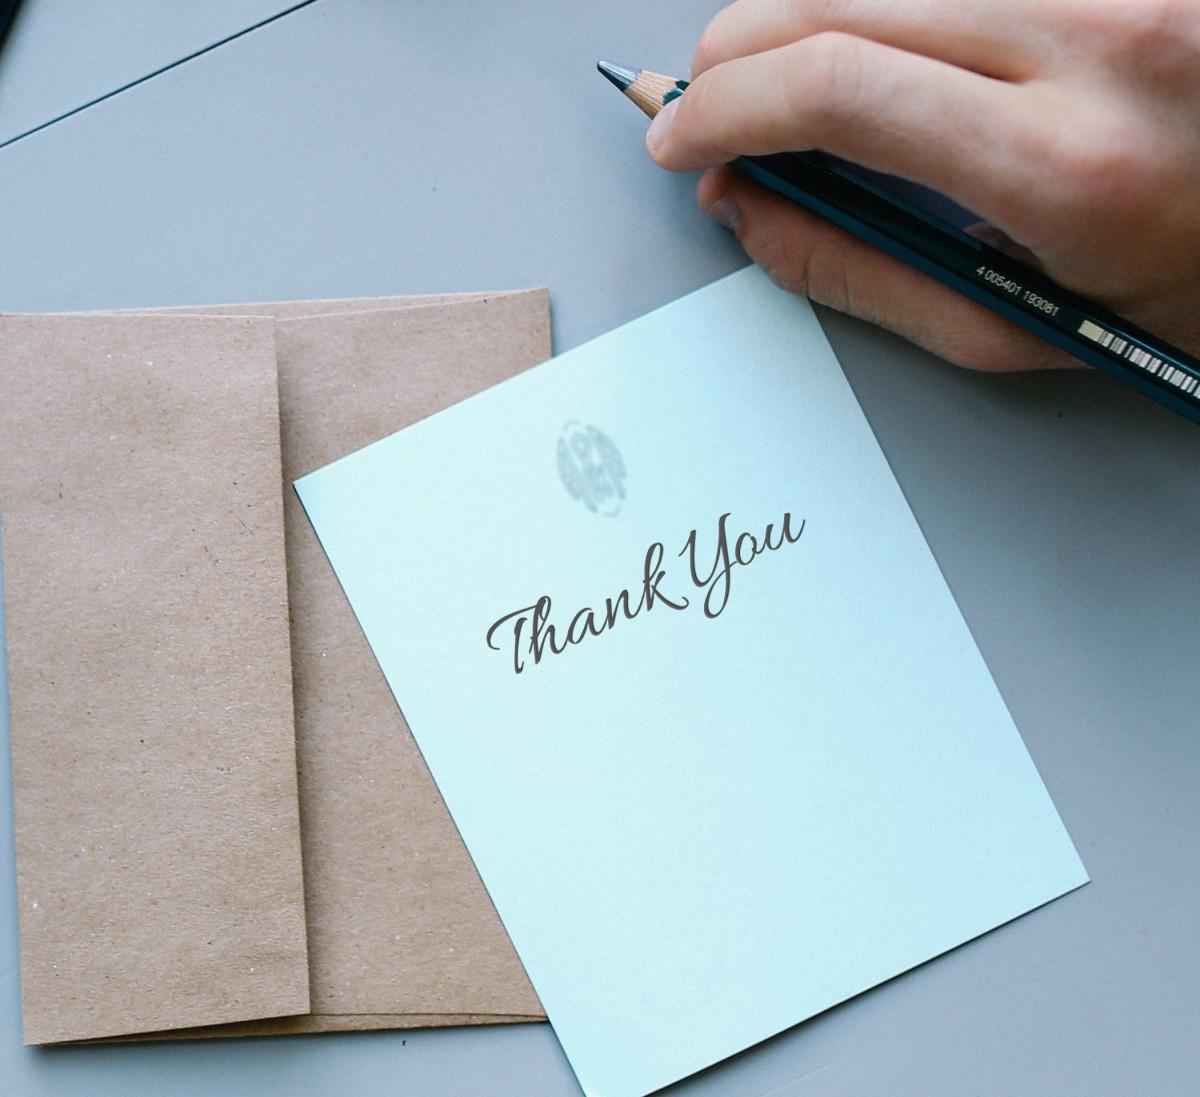 thank_you_thanks_card_message_note_appreciation_grateful_gratitude-924915